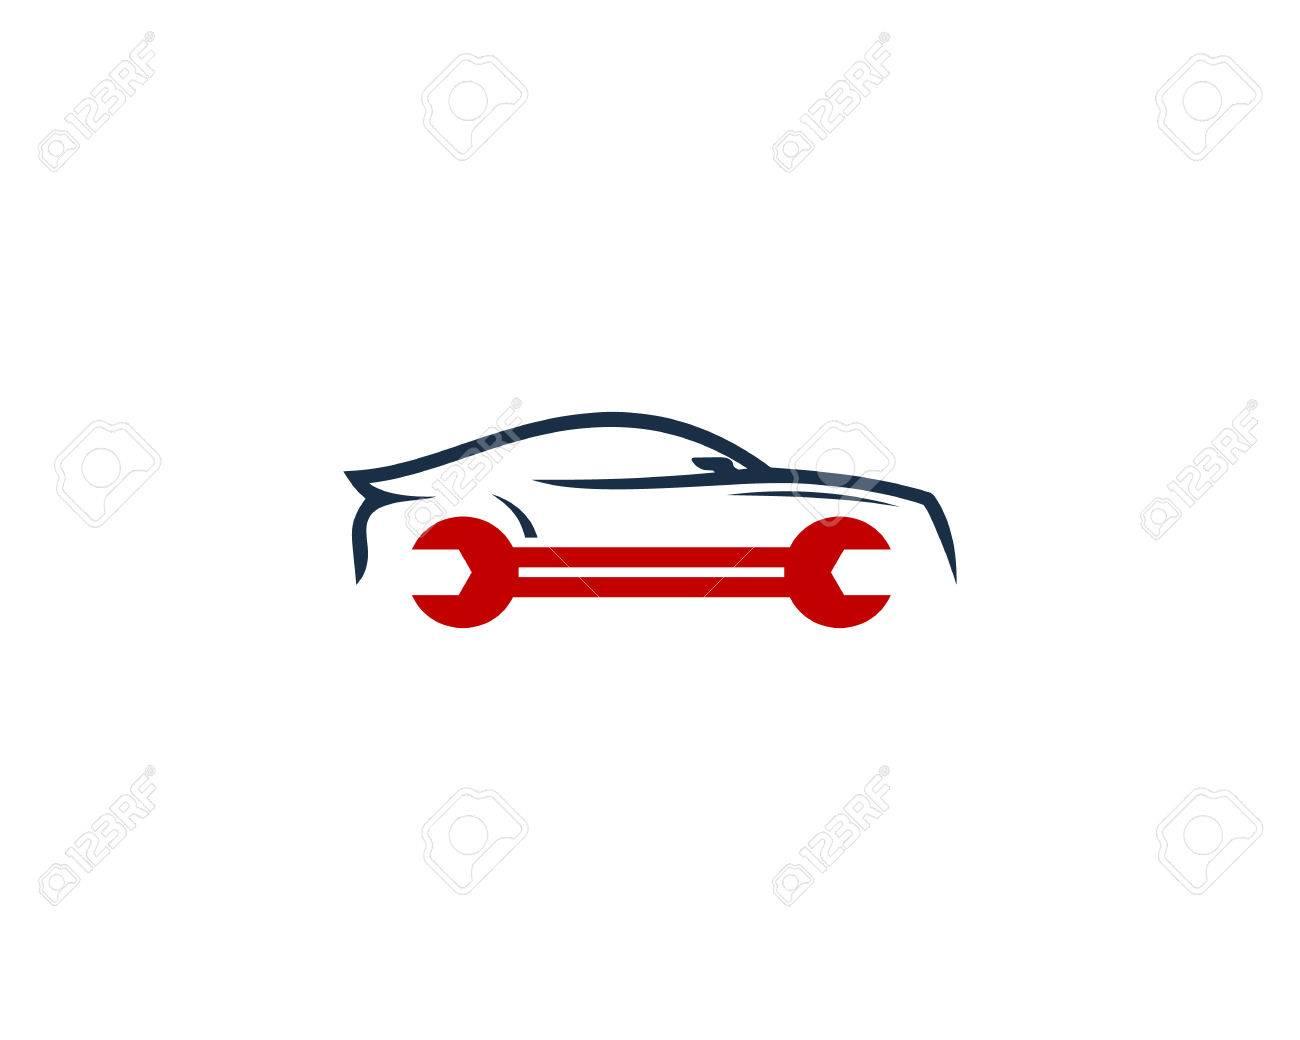 fix repair icon logo design element royalty free cliparts vectors rh 123rf com vehicle repair log form vehicle repair log sheet